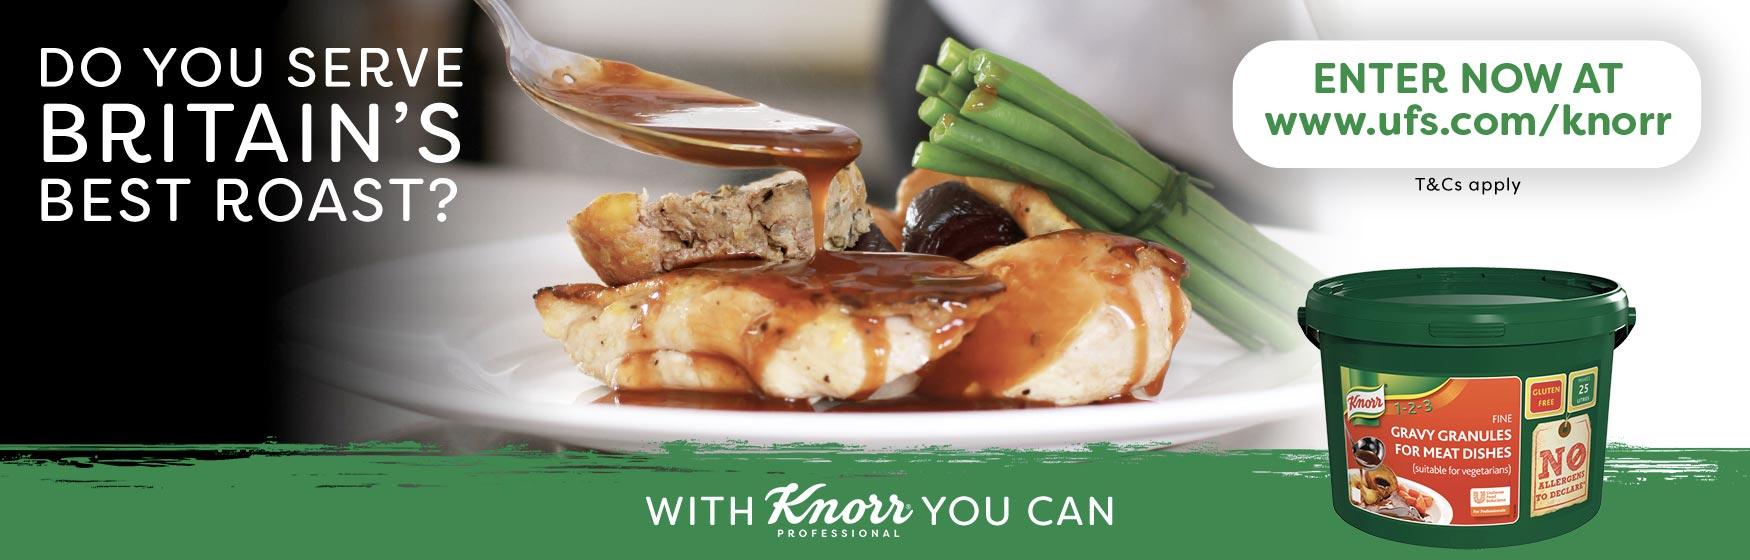 Knorr – do you serve Britain's best roast